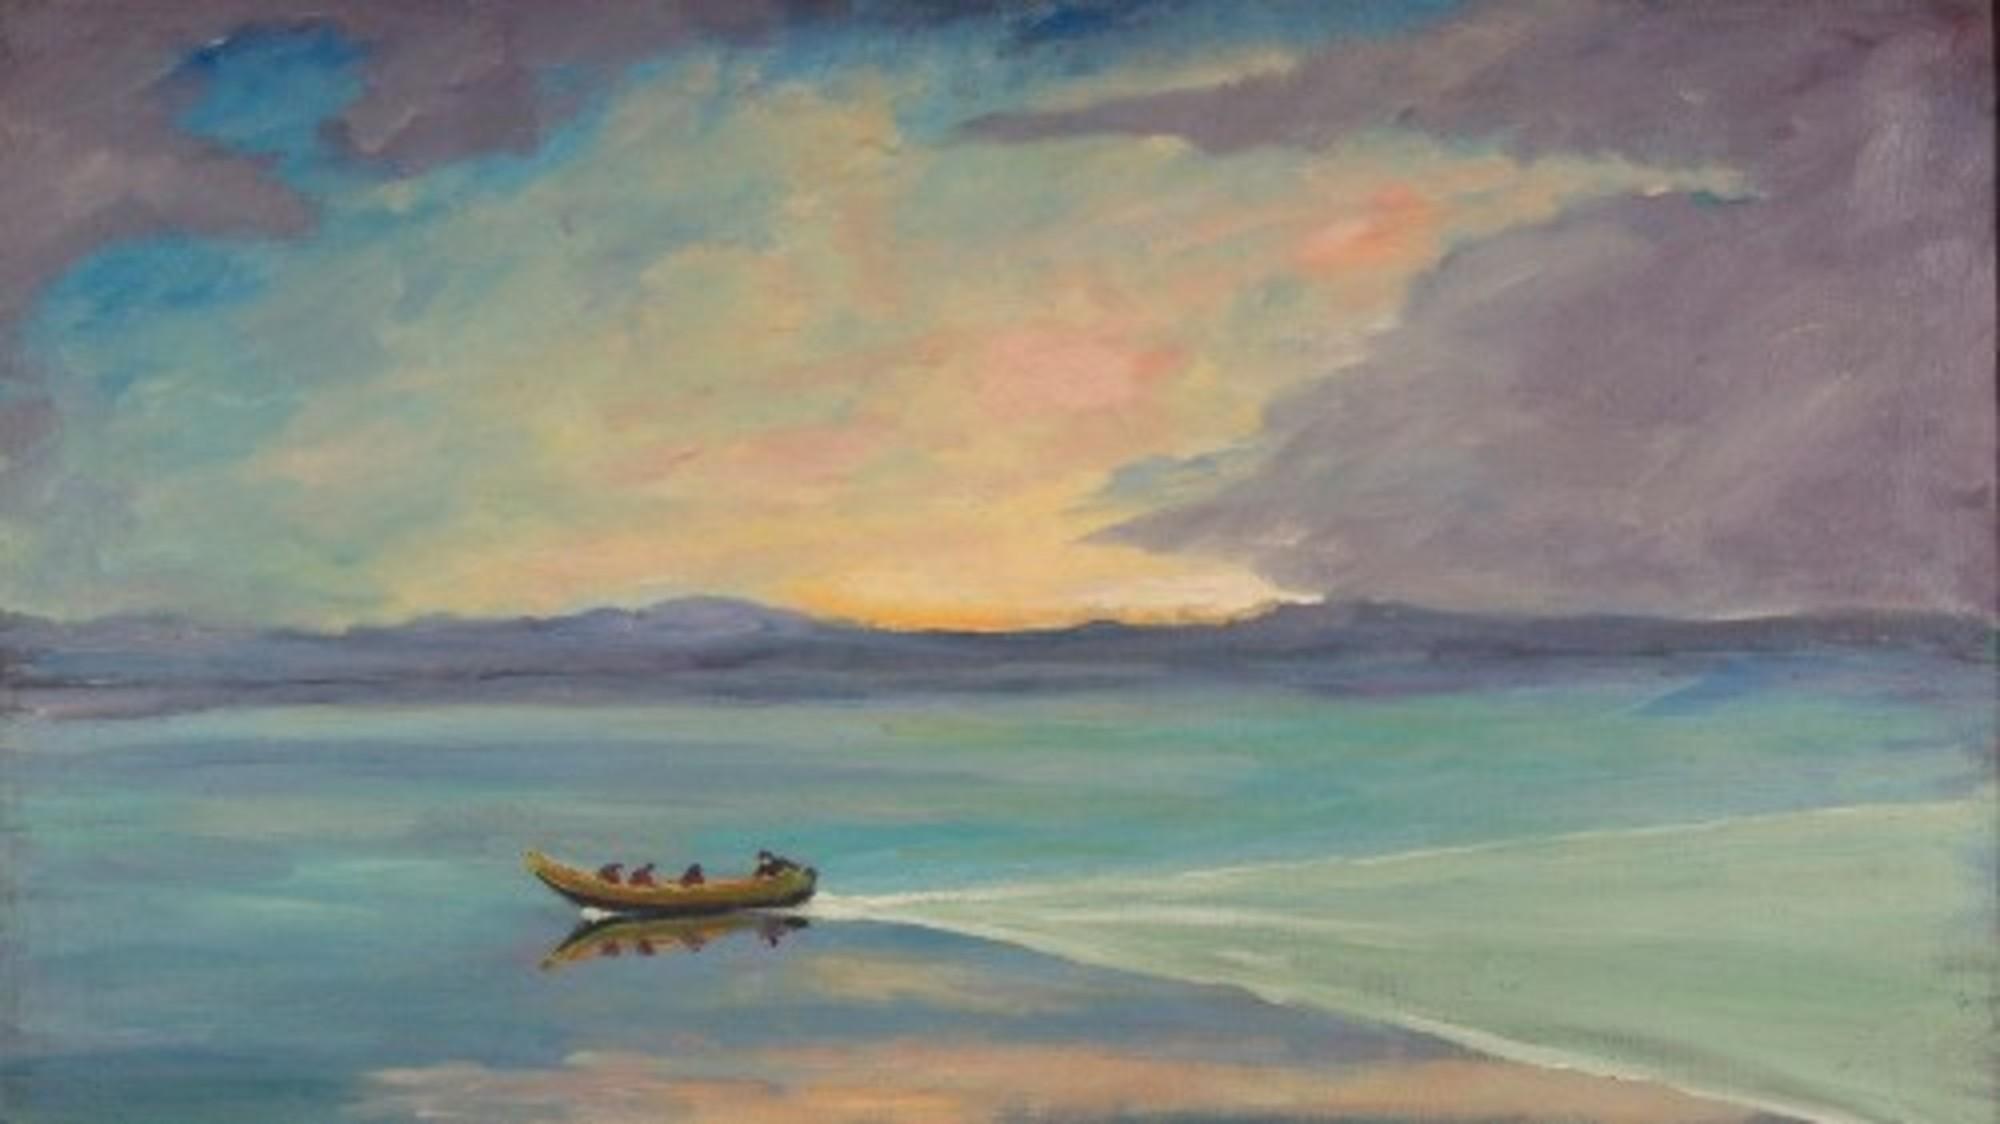 ss02-winston-churchill-painter-kempner-gallery-washington-st-louis.jpg